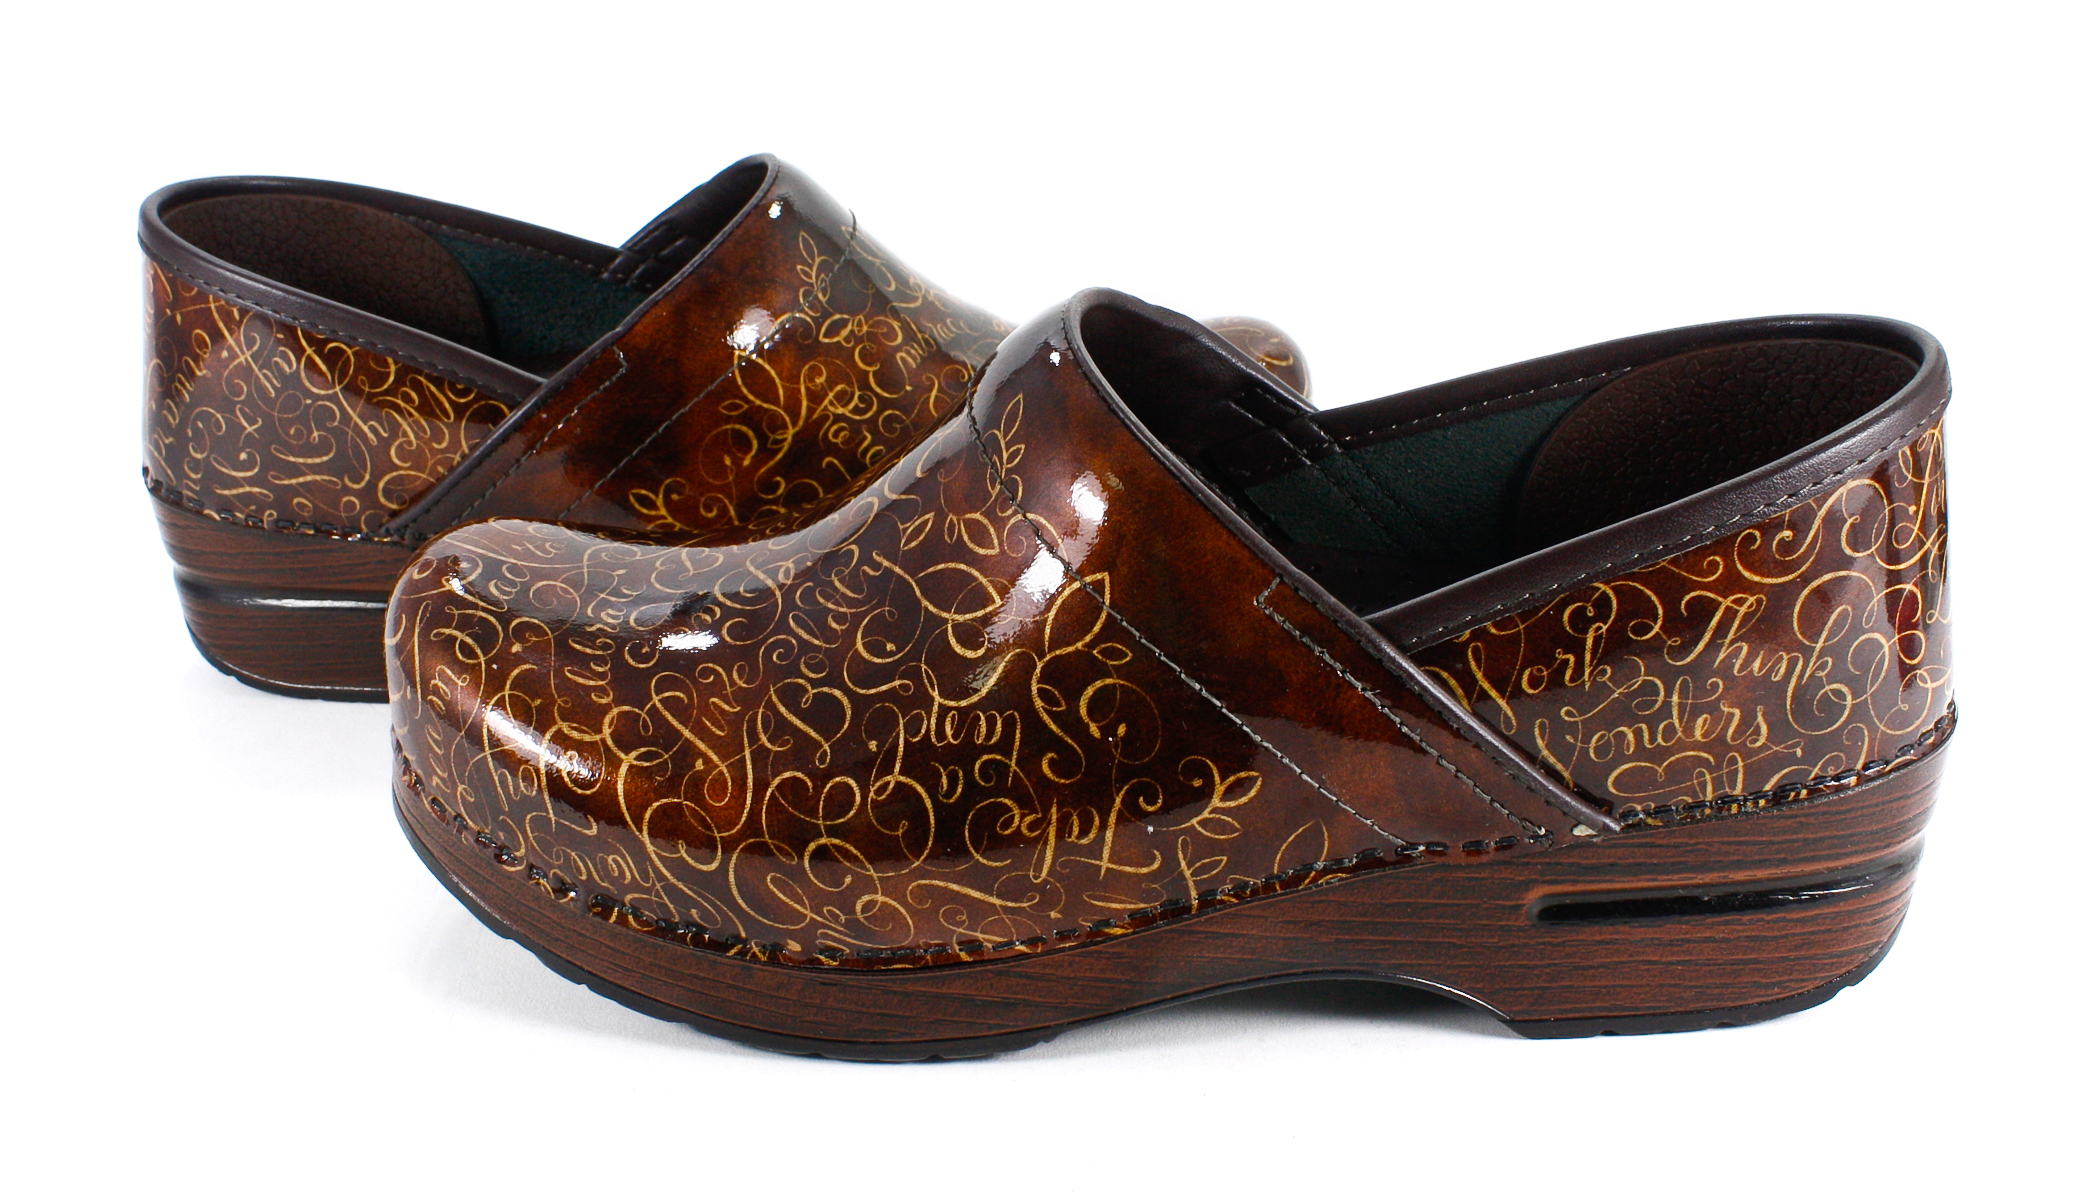 Dansko Professional Clogs Shoes Womens